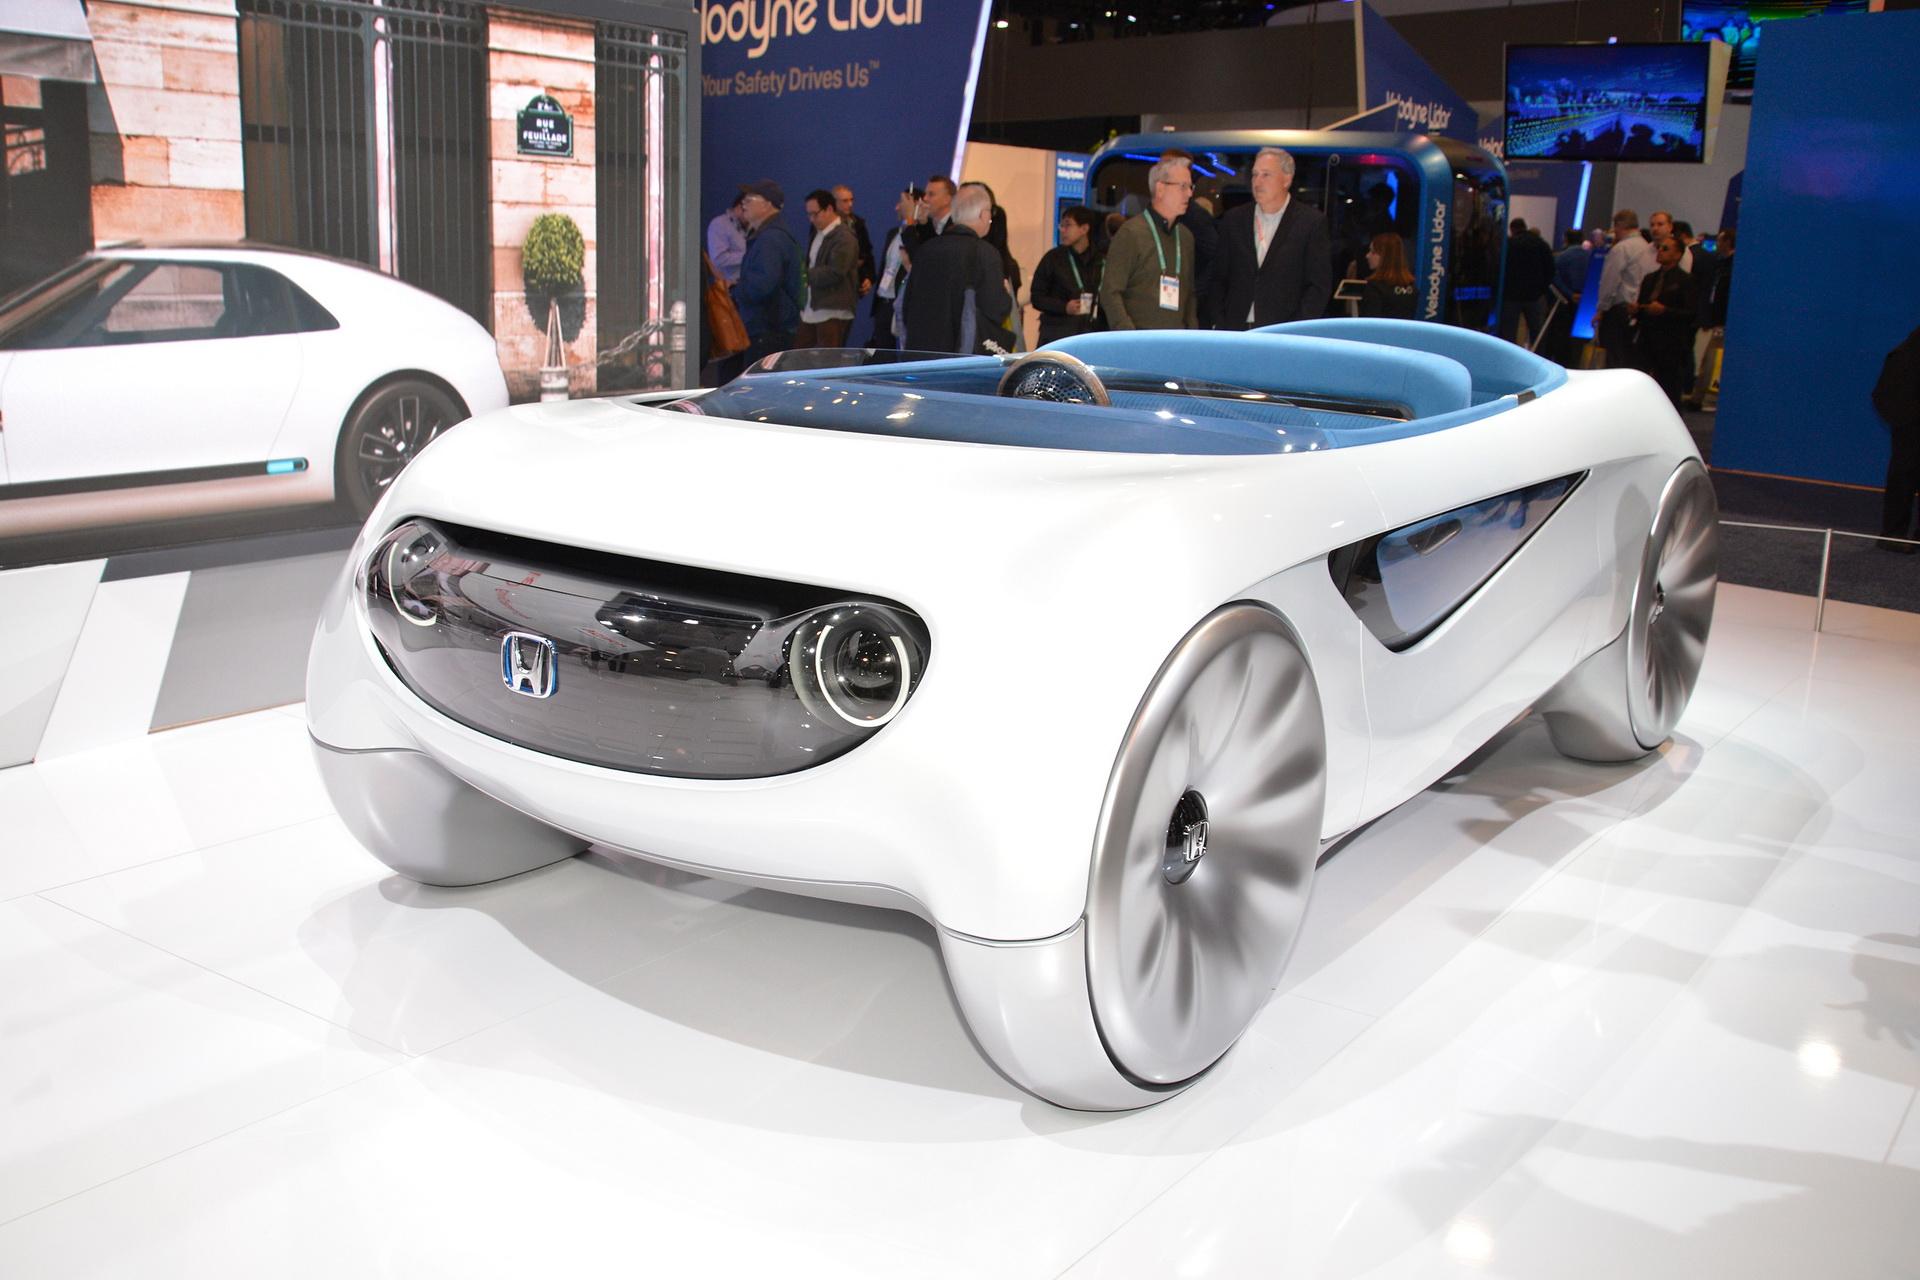 honda-augmented-driving-concept-ces-livepics-2.jpg